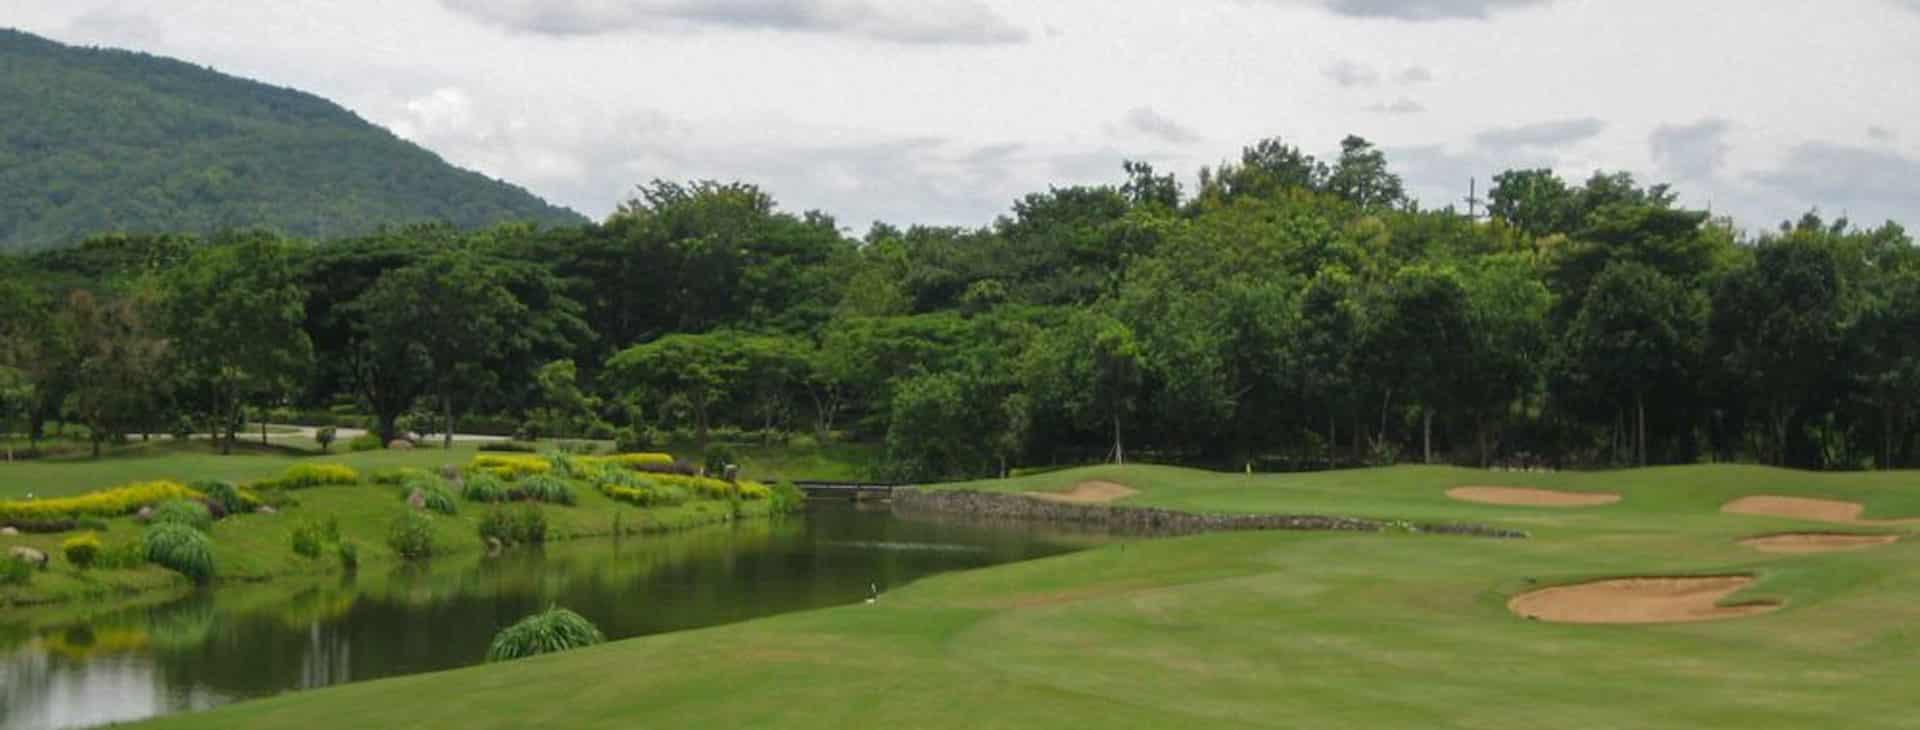 Golf Thailand_Golf Courses_Chiang Rai_Santiburi Country Club